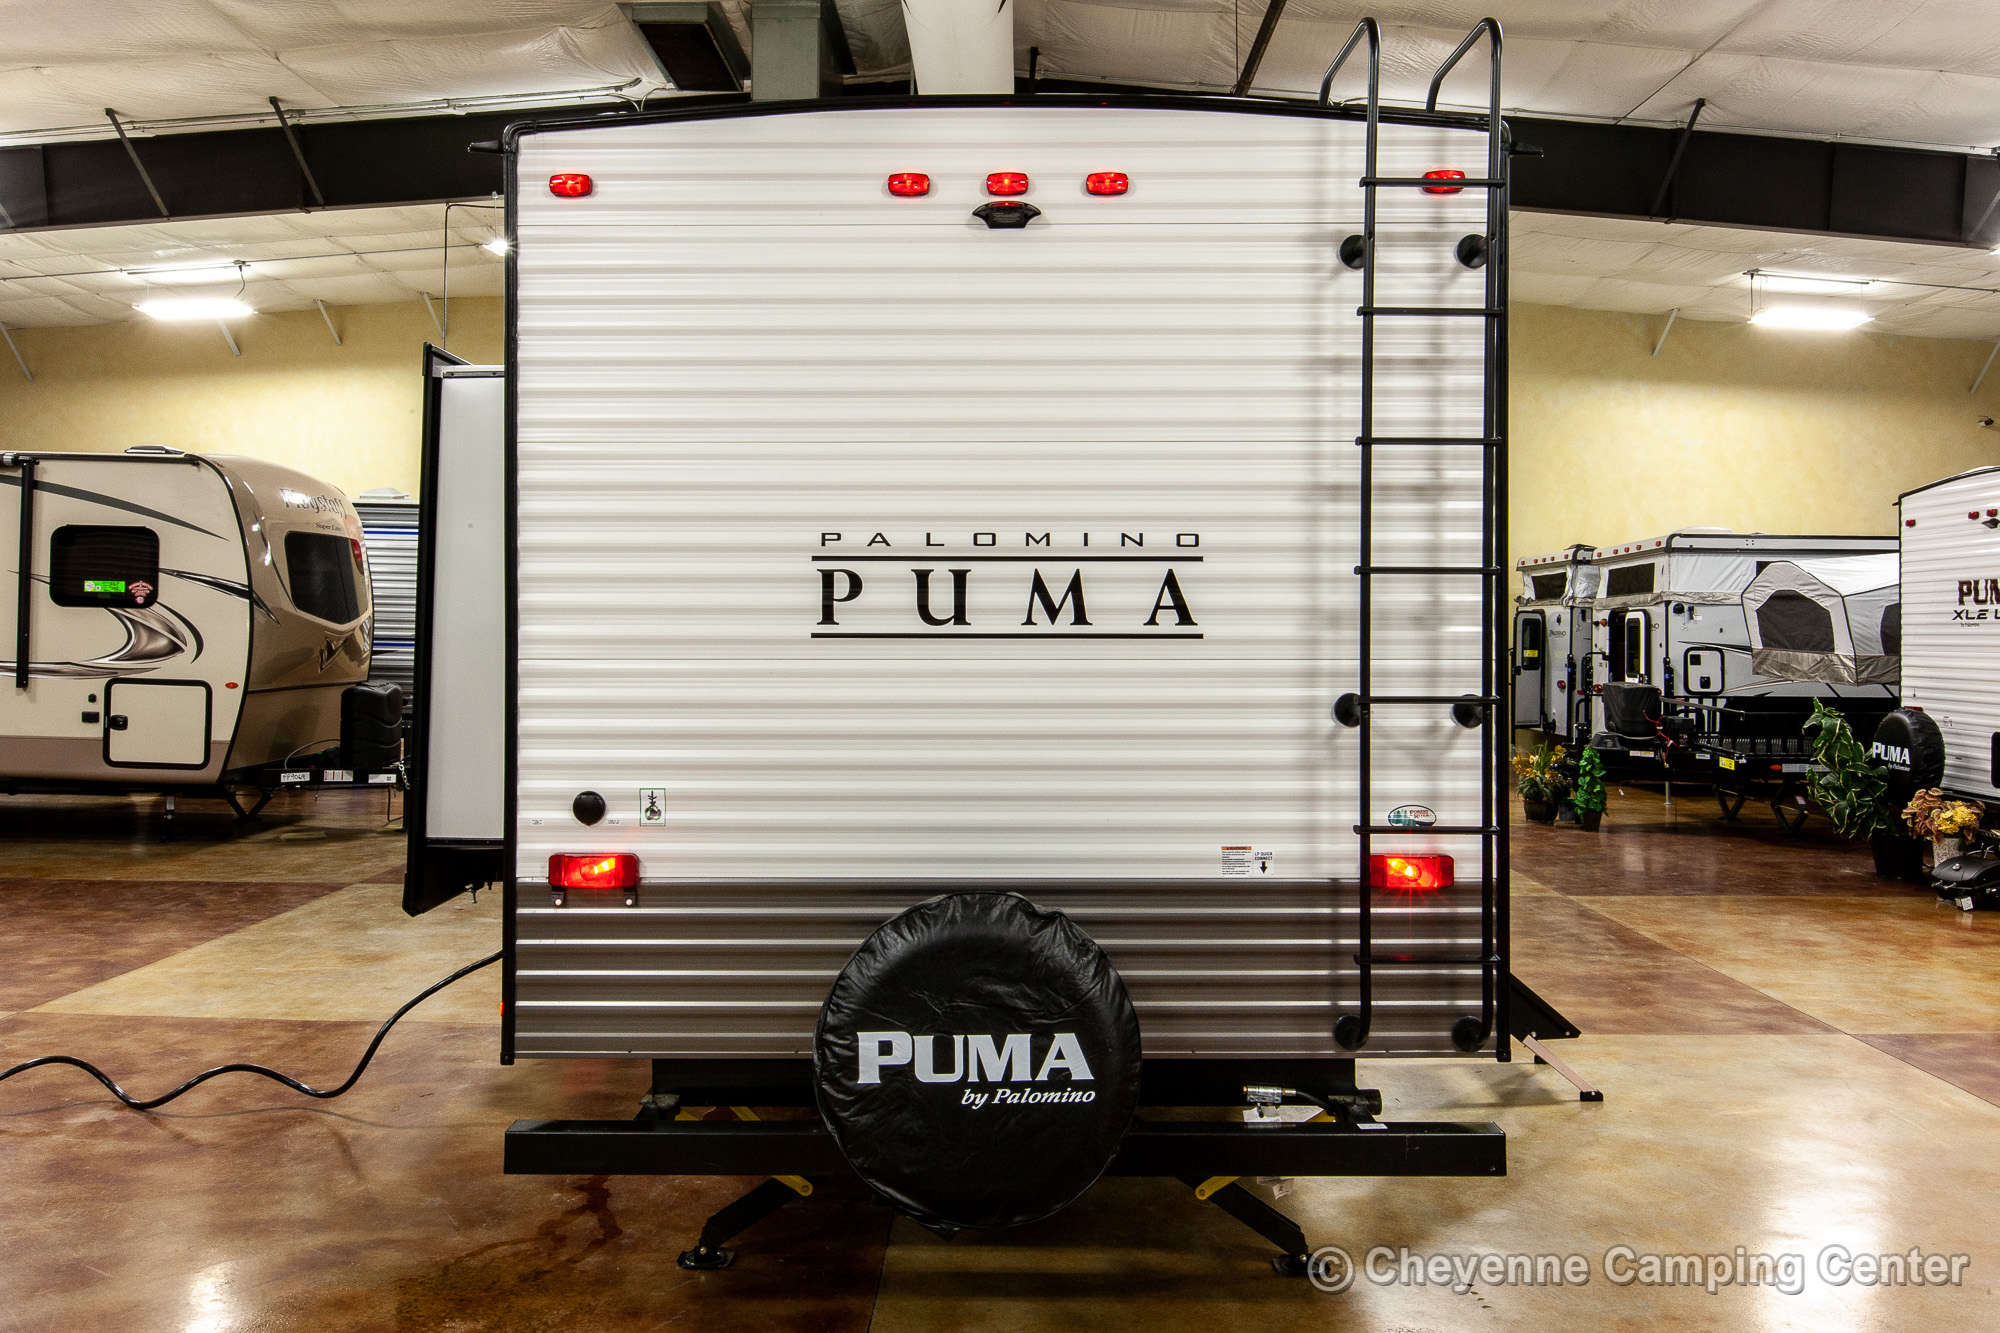 2020 Palomino Puma 28BHSS Bunkhouse Travel Trailer Exterior Image